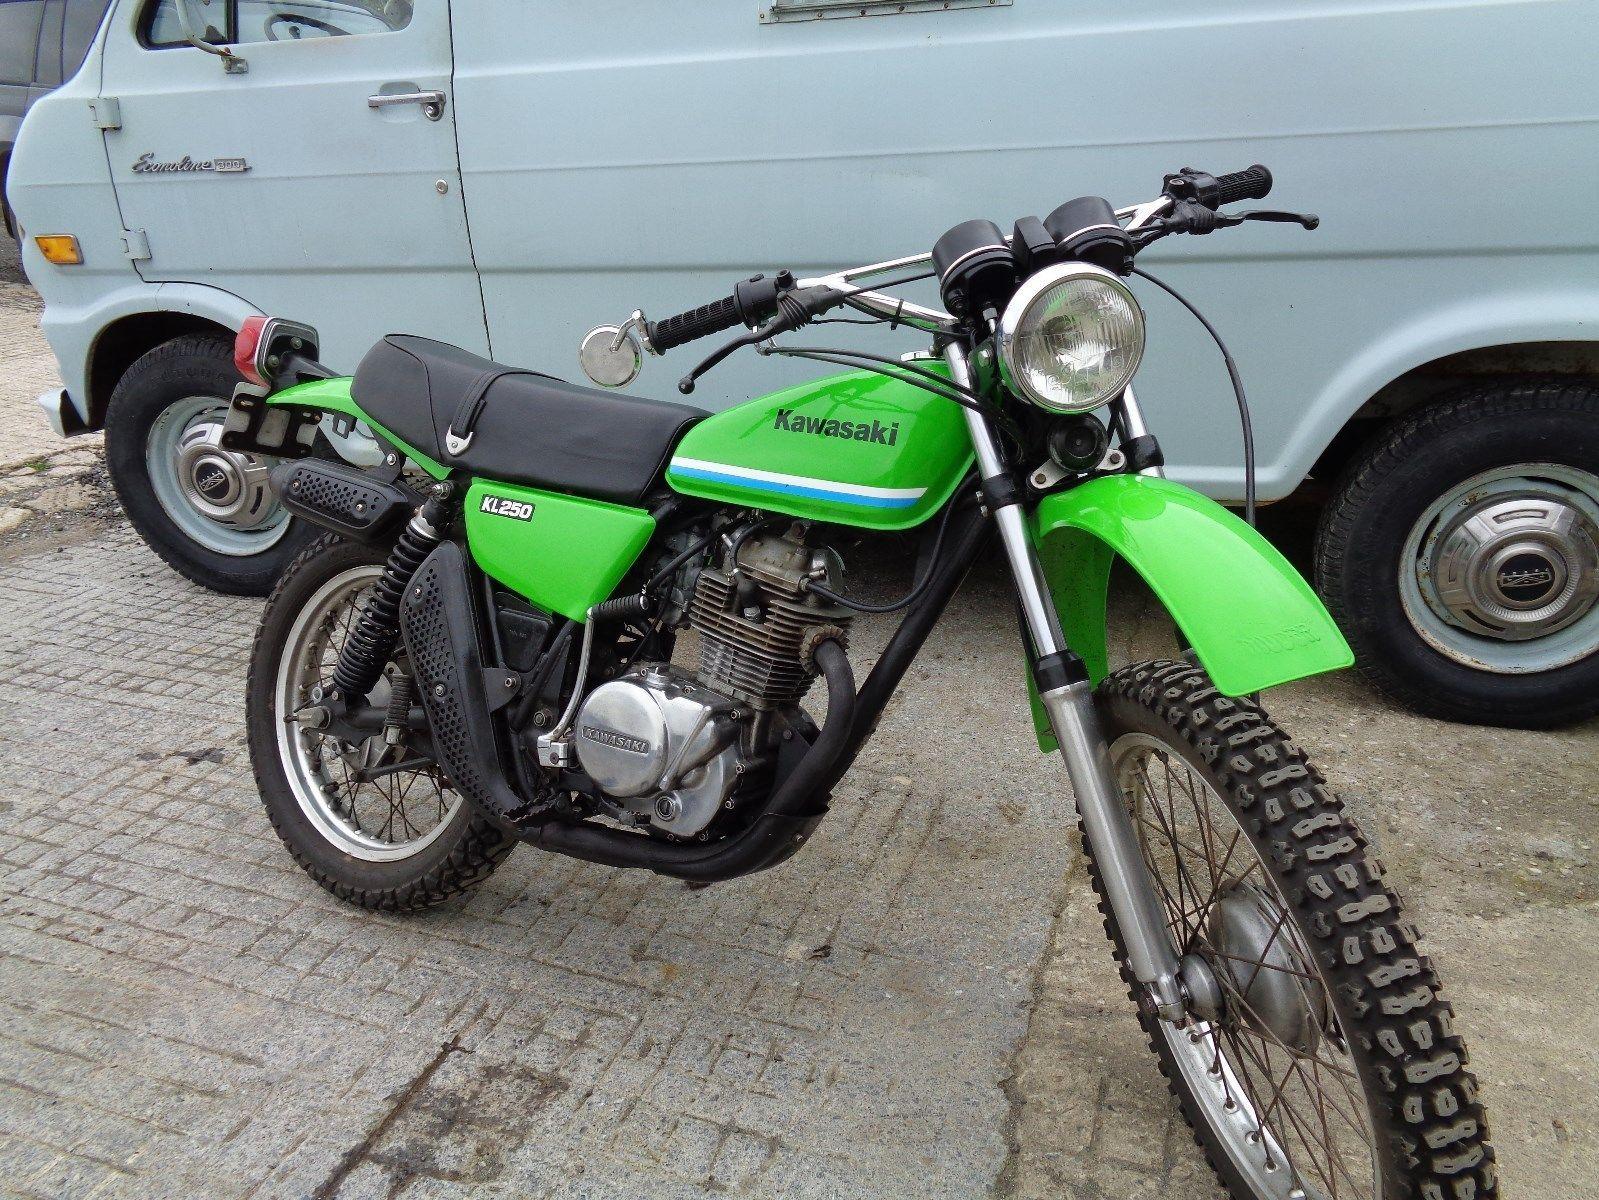 eBay: RARE 1978 KAWASAKI KL250, HARD TO FIND IN THIS LOVELY